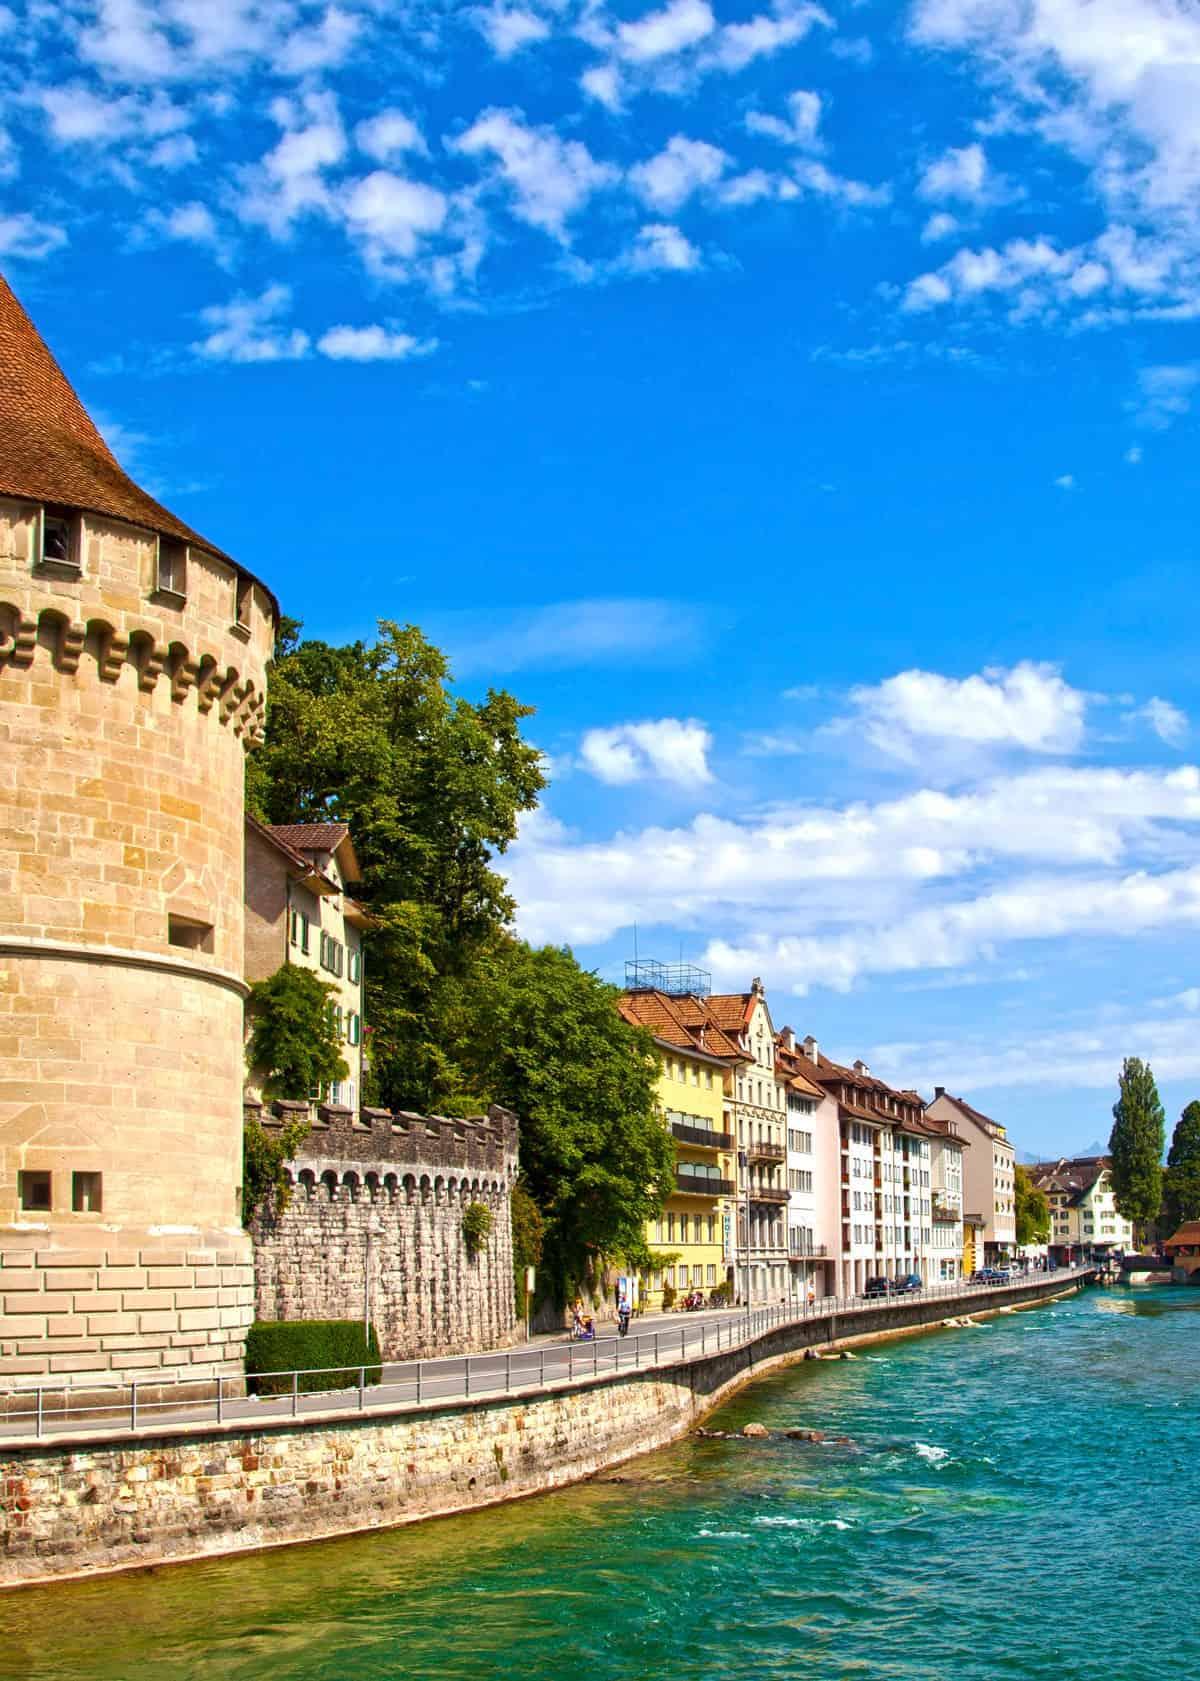 Moving ot Switzerland